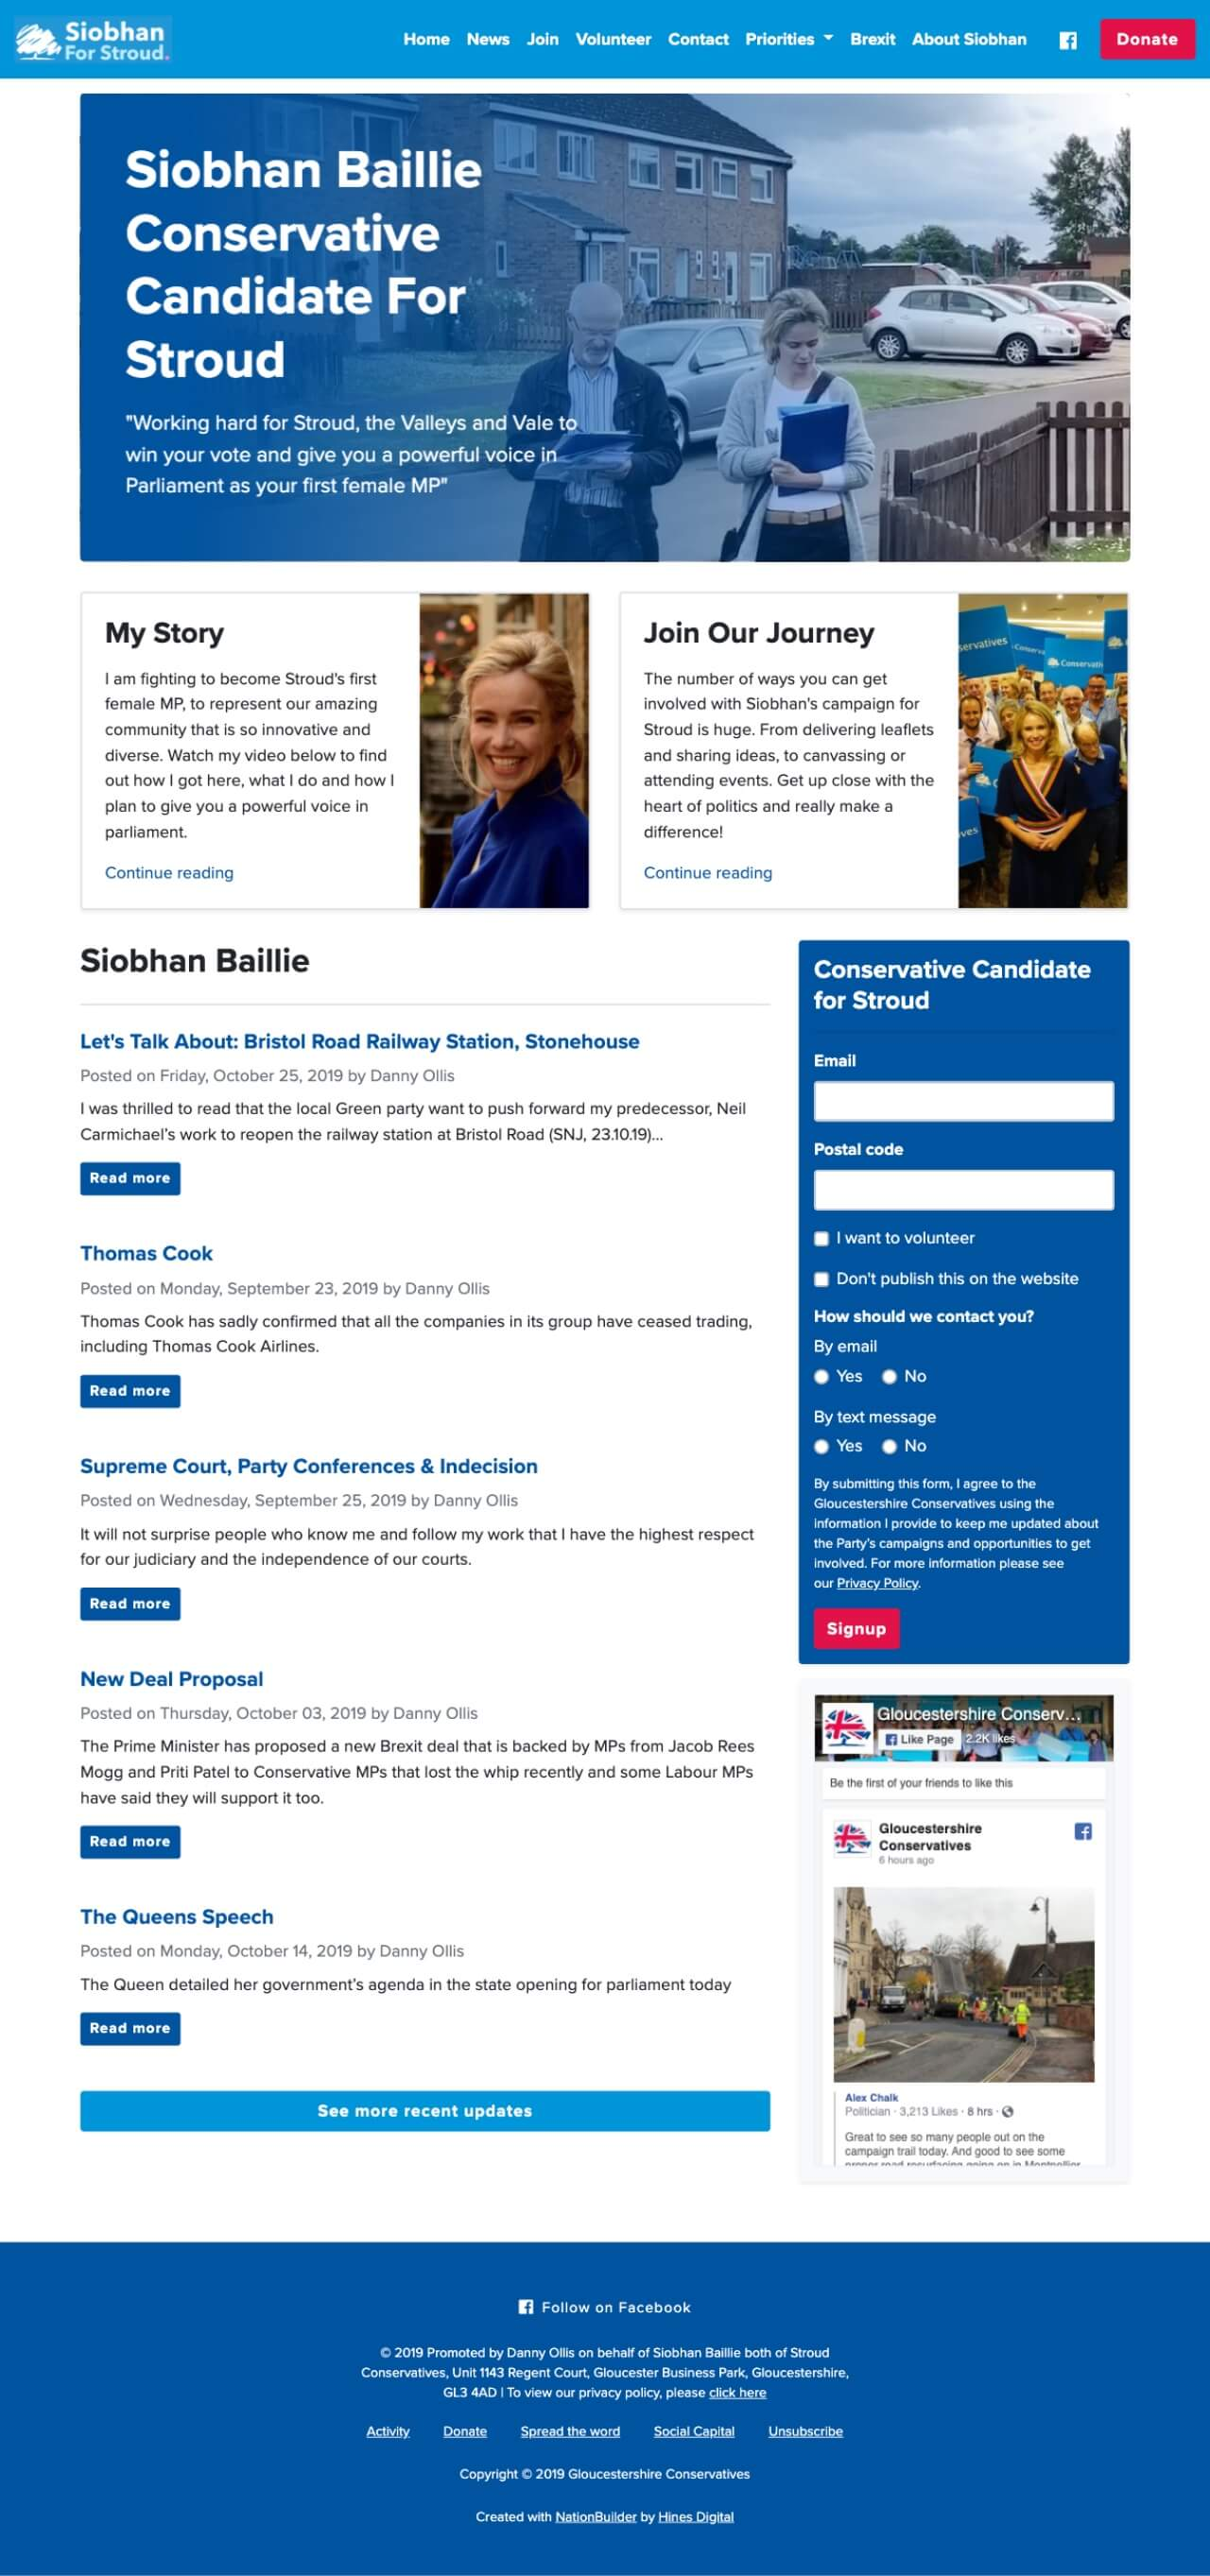 Screenshot: Siobhan Baillie Homepage